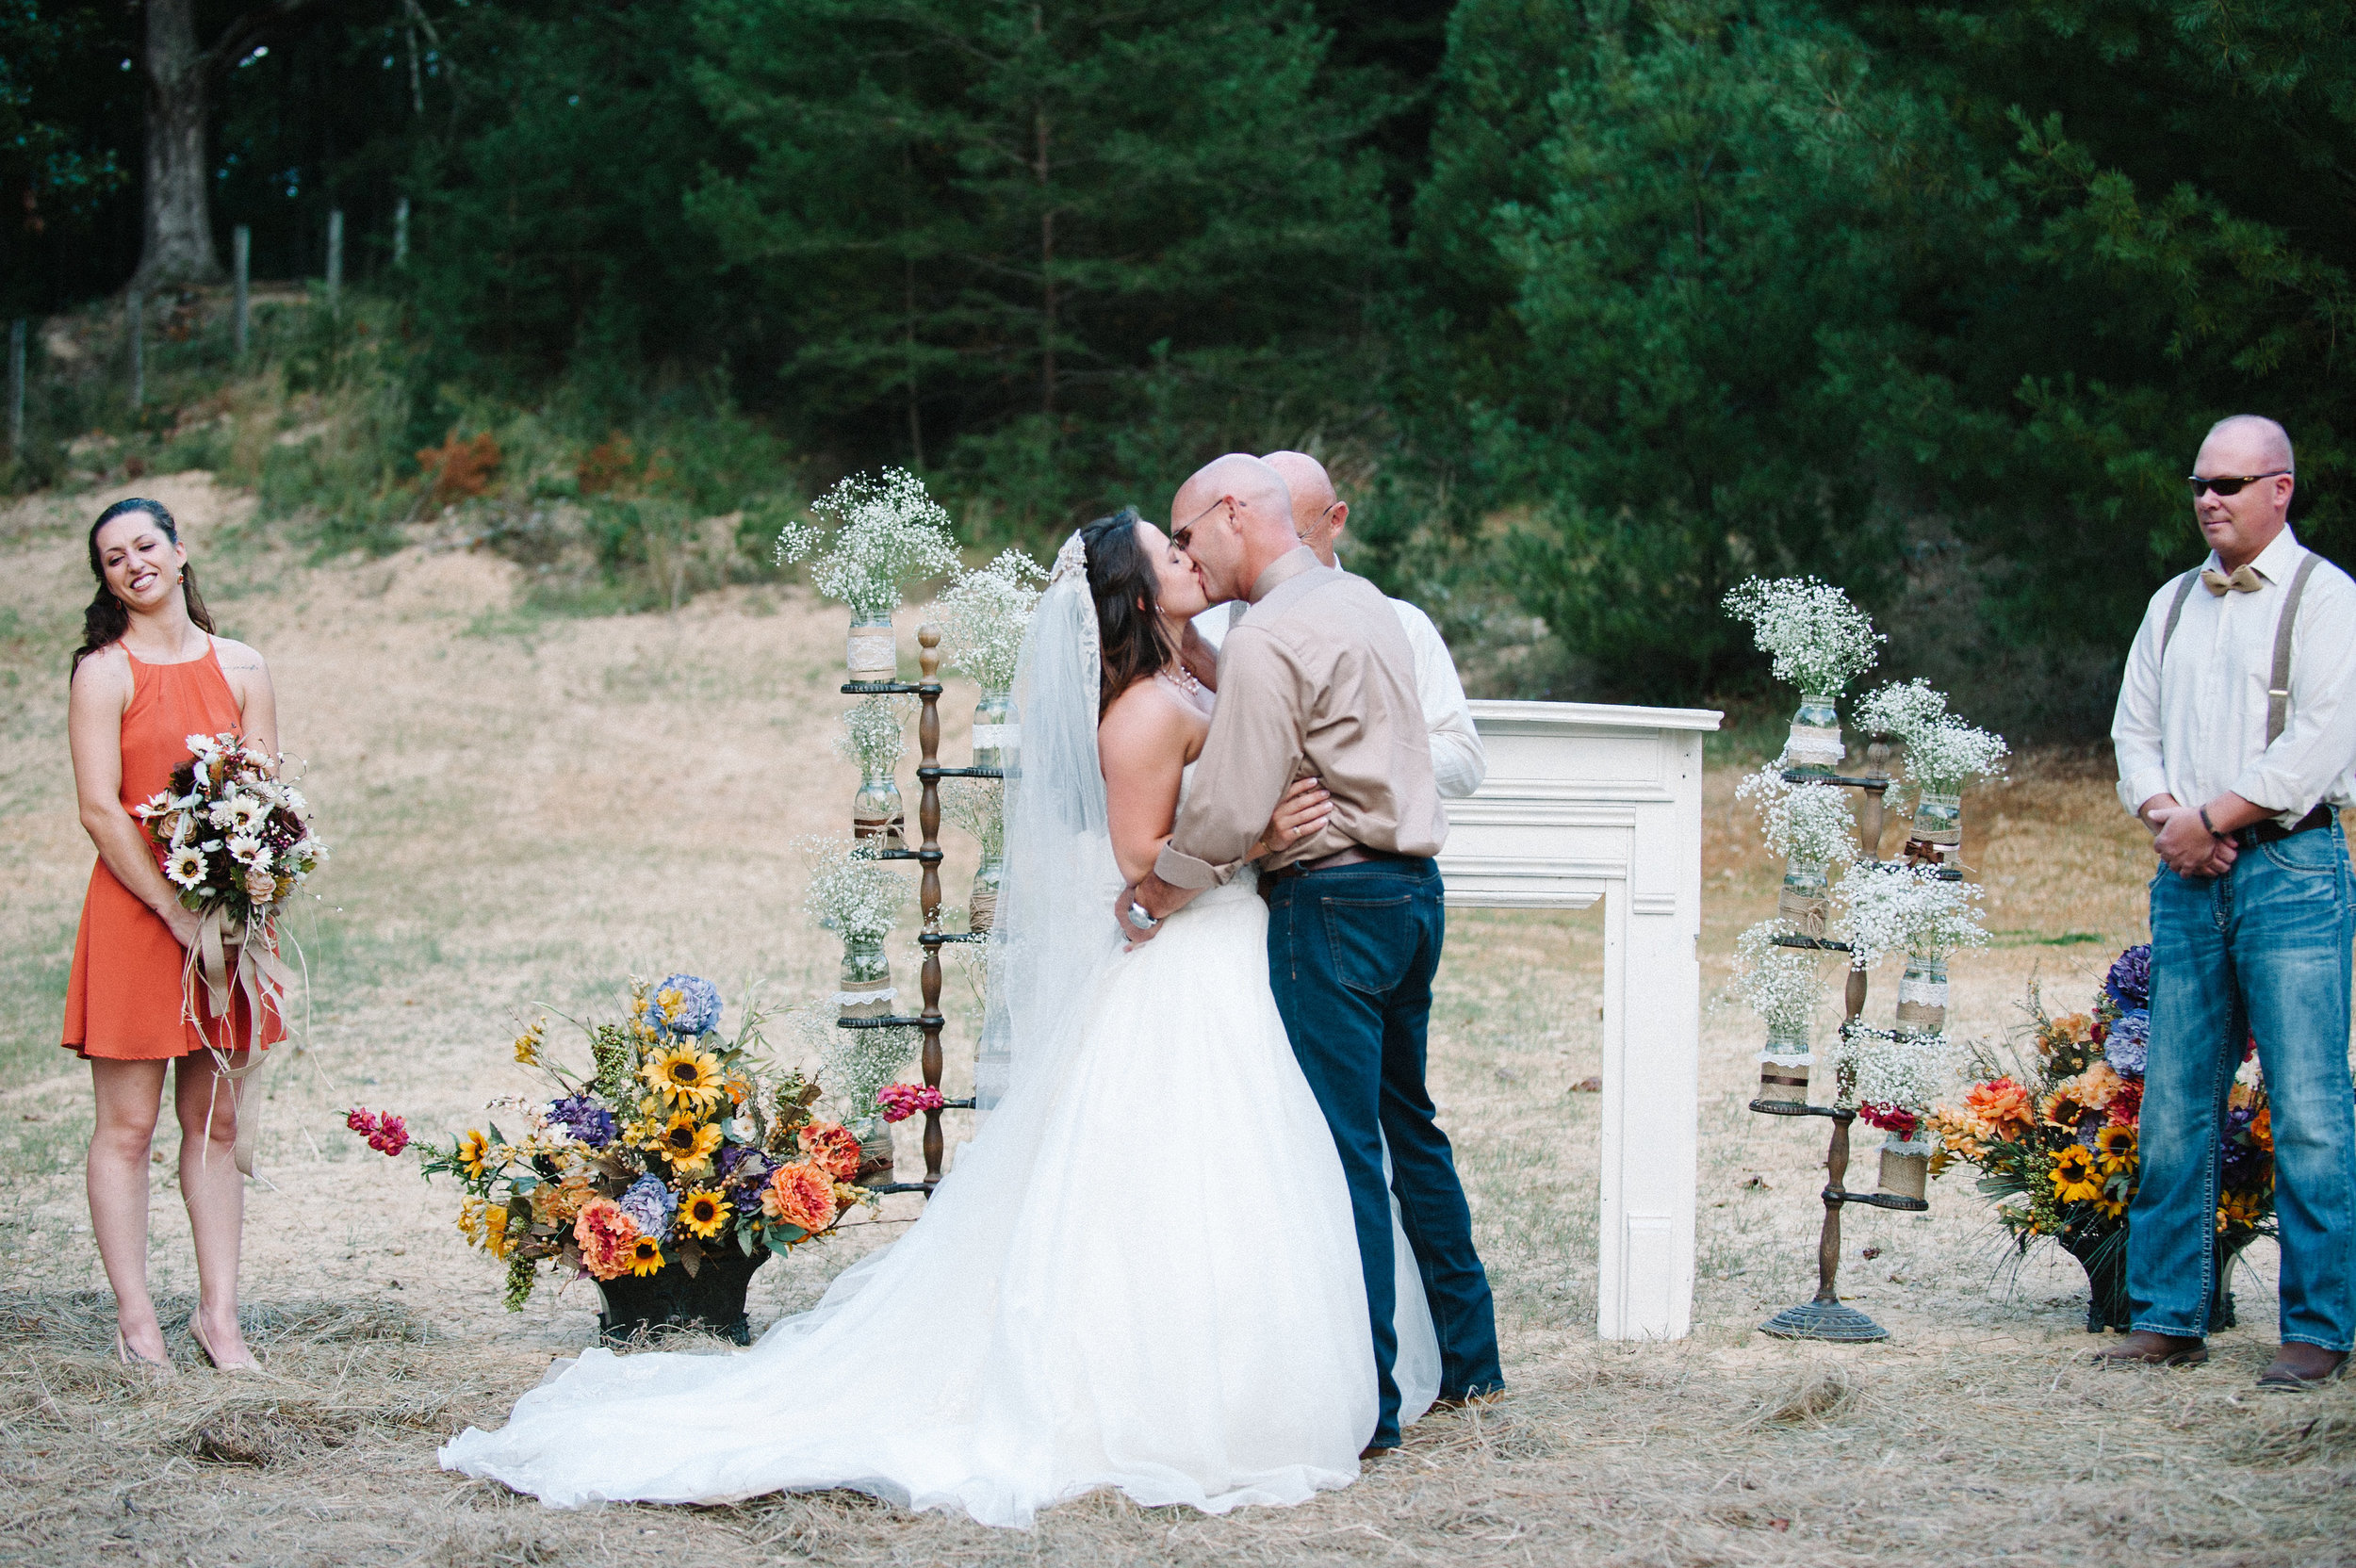 first-kiss-at-wedding.jpg